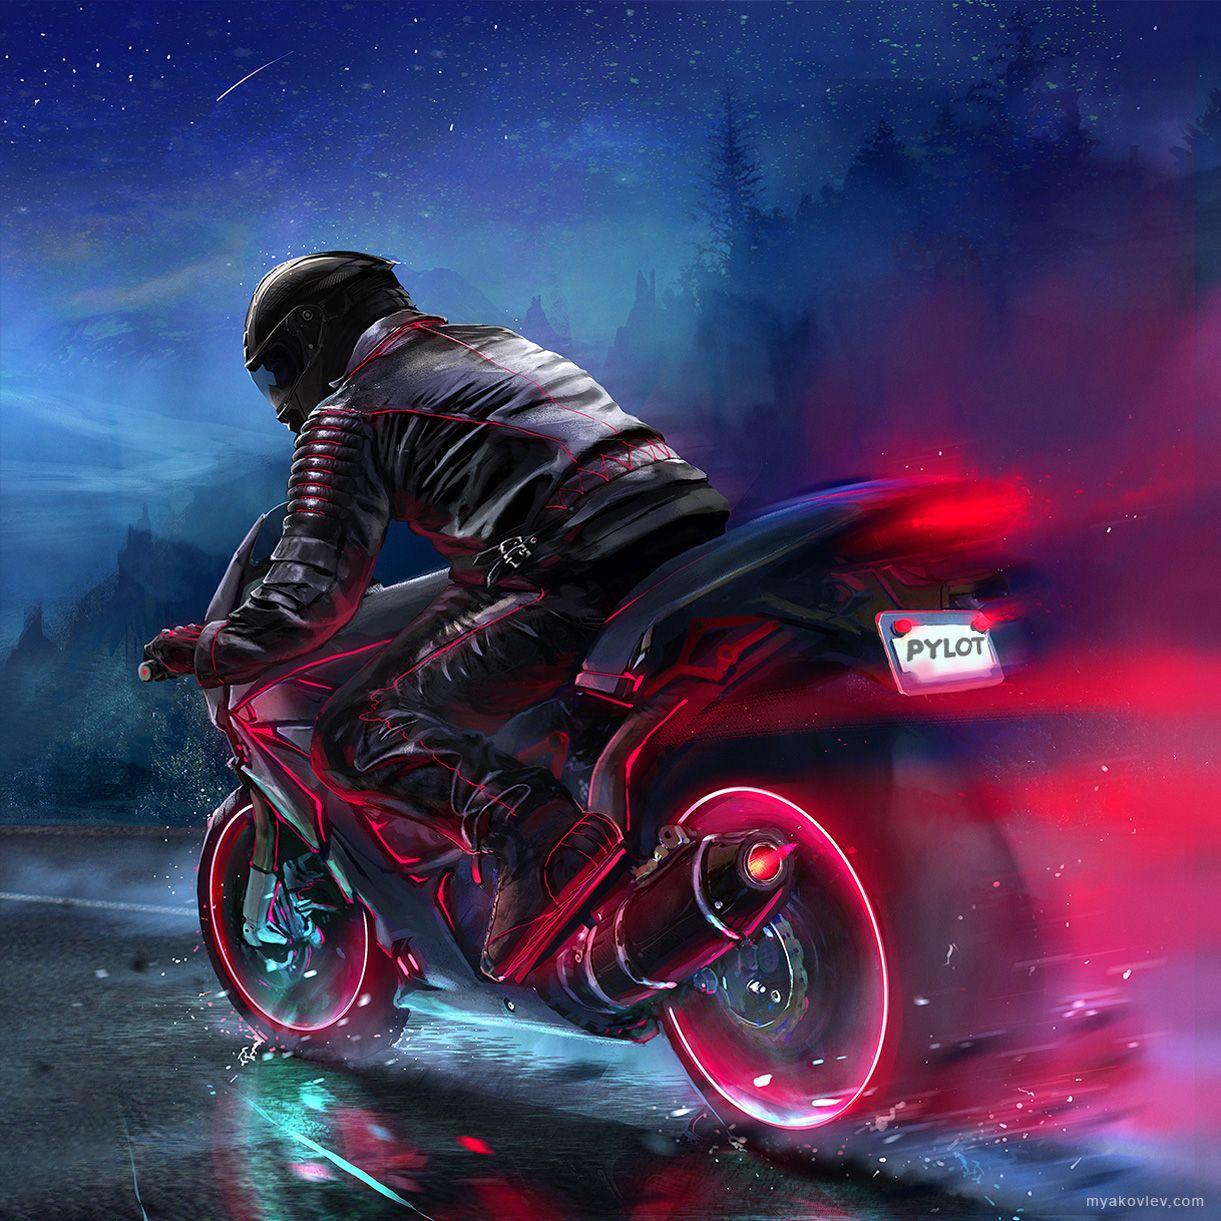 After Dark Digital 1221x1221px Biker Art Motorbike Art Motorcycle Wallpaper